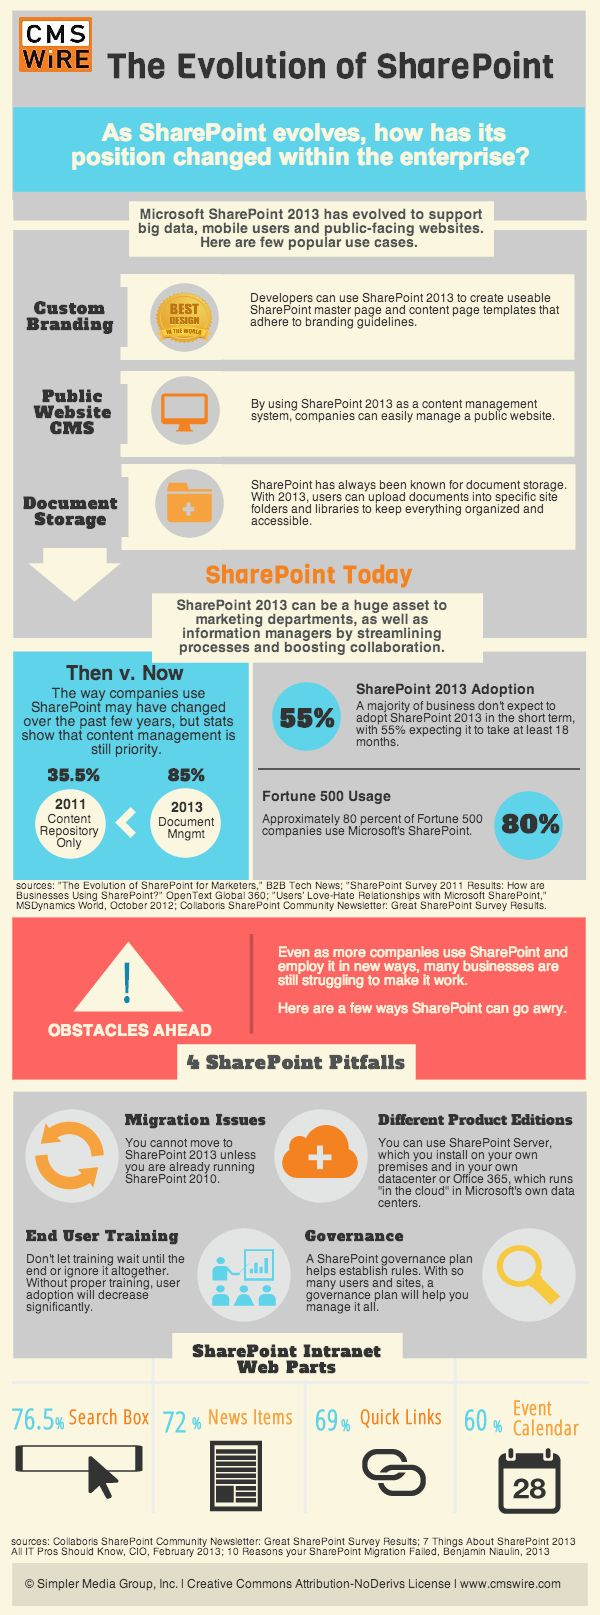 196 best SharePoint Geek images on Pinterest | Info graphics ...